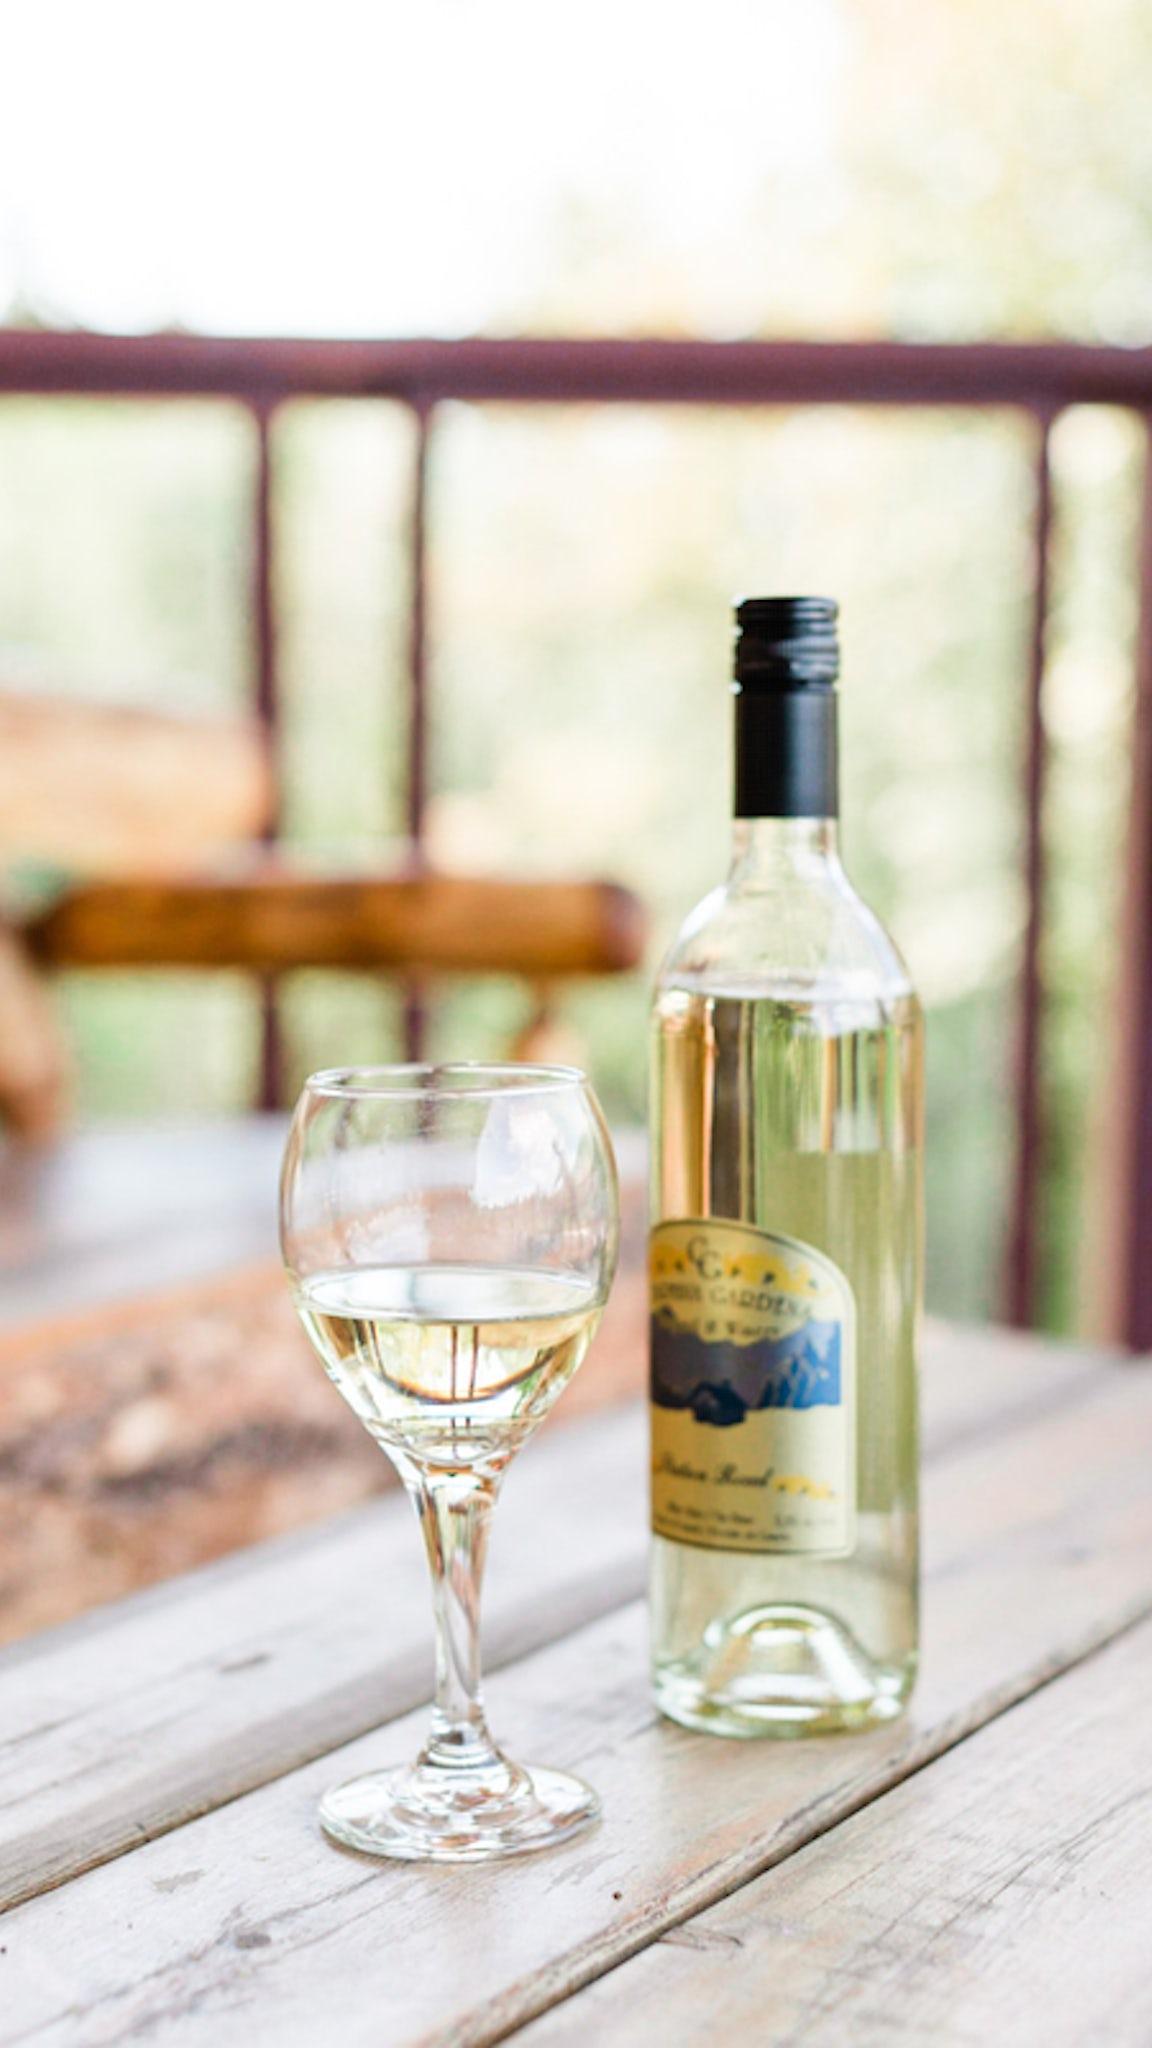 Columbia Garden Winery & Vineyard in Trail, BC